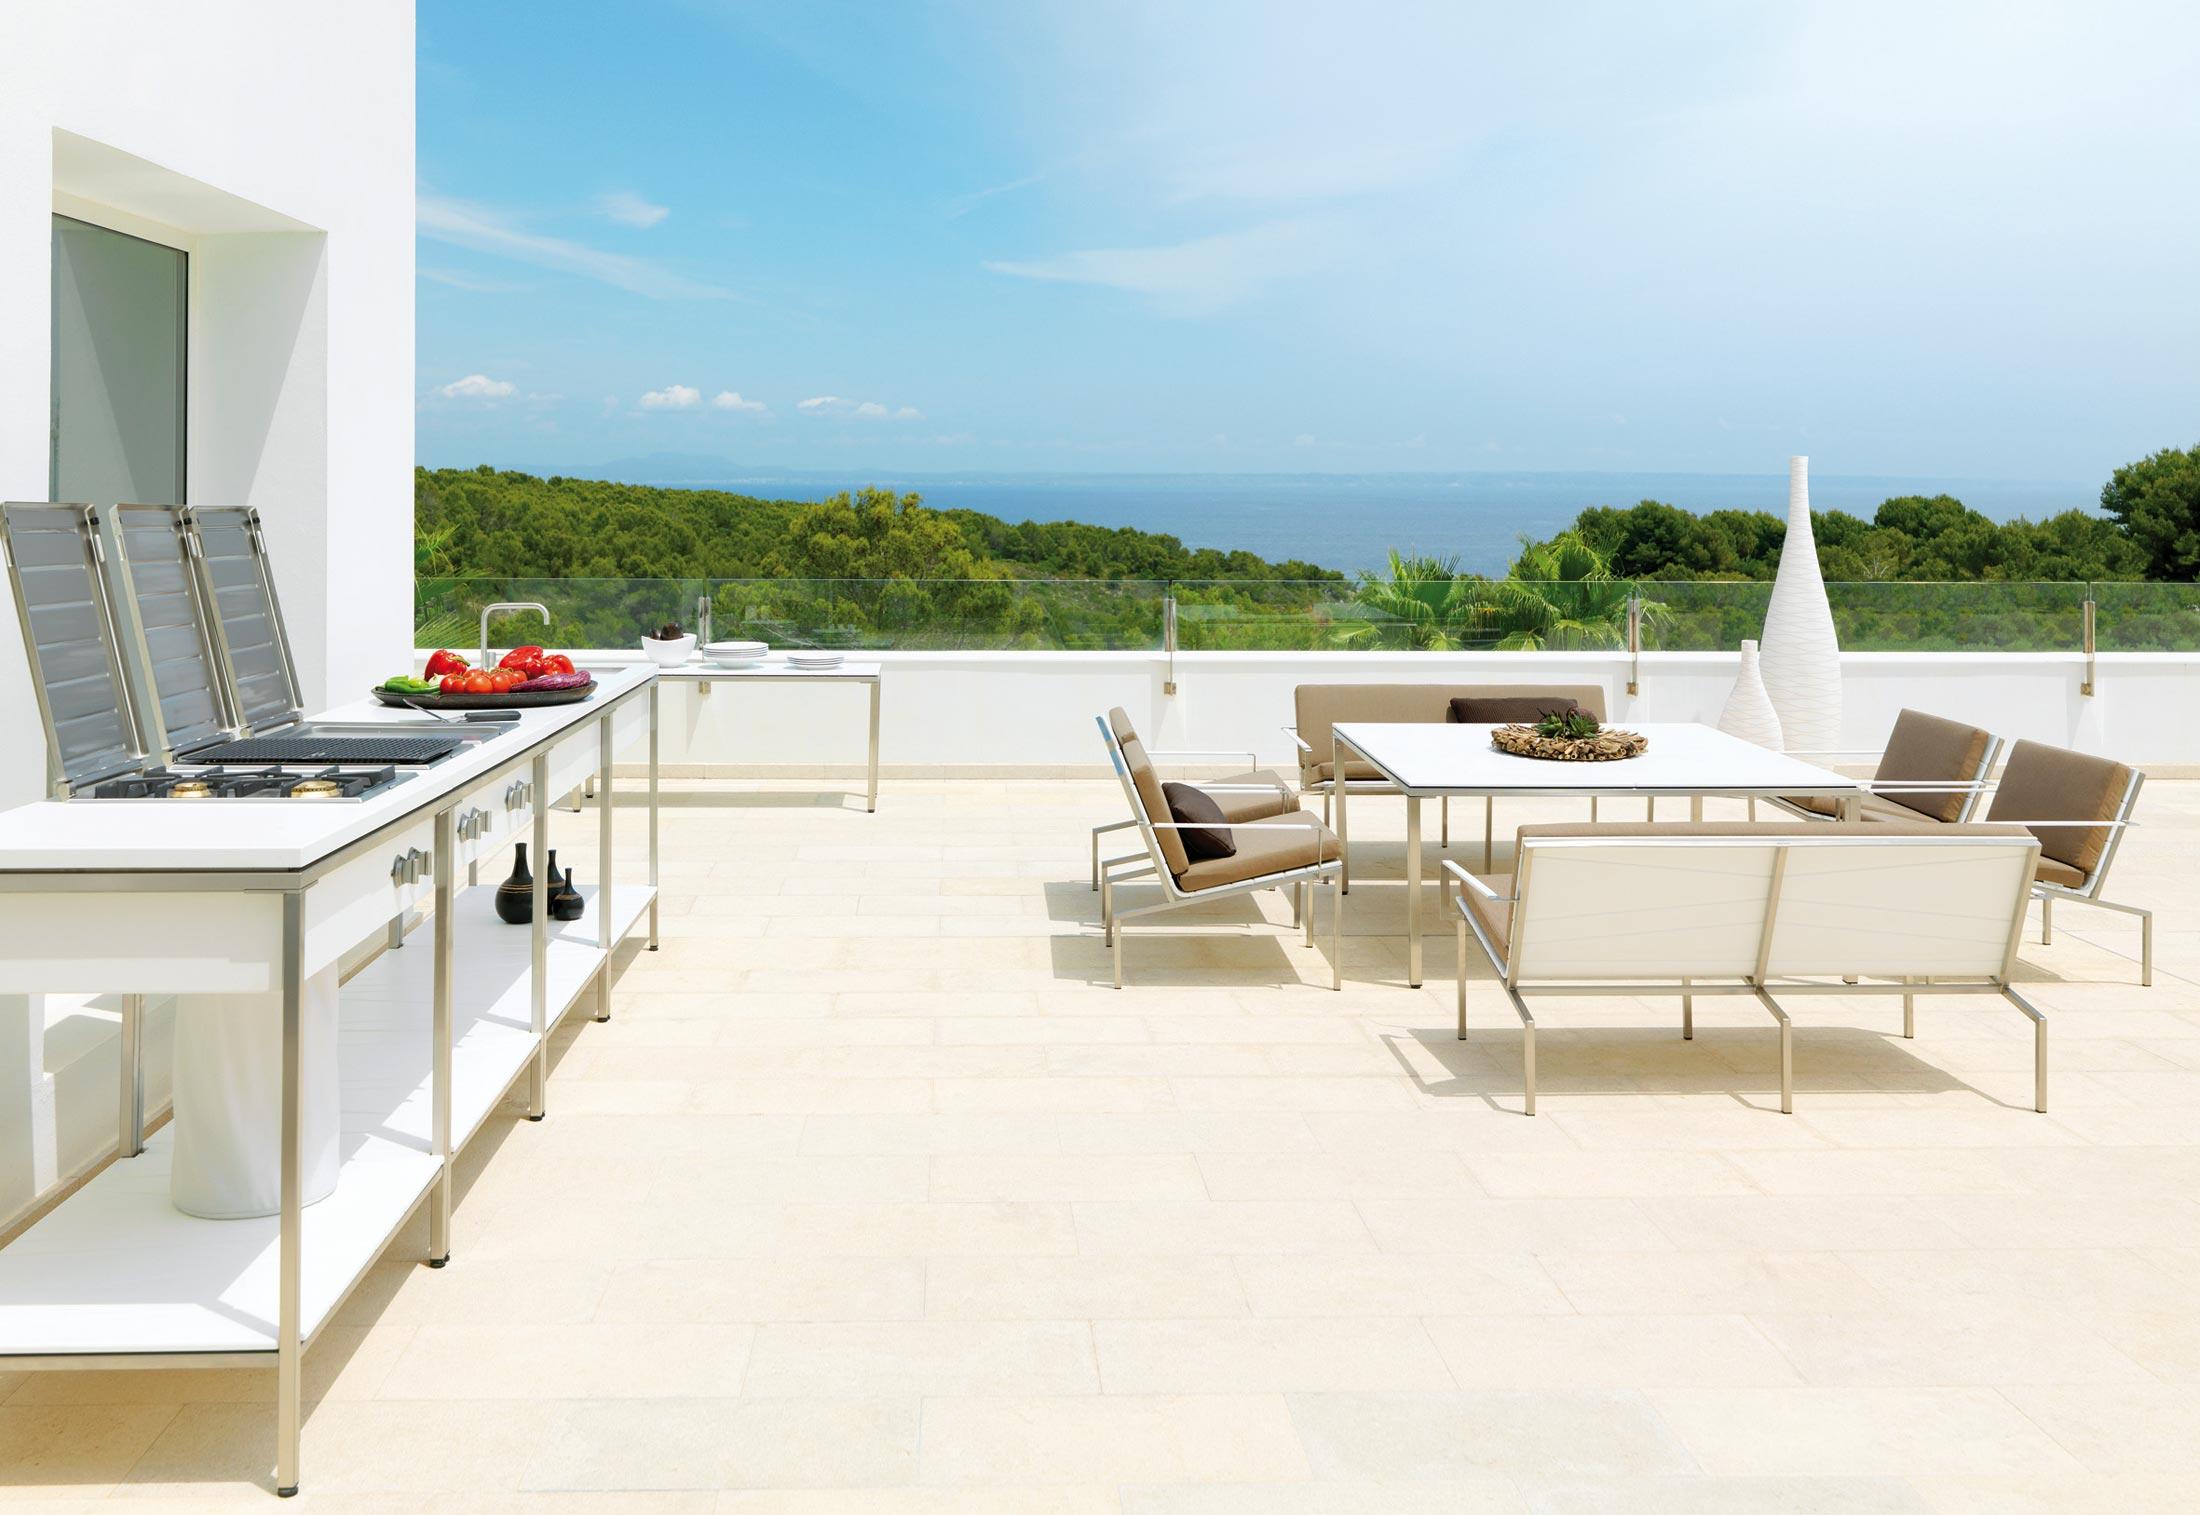 Outdoor Küche Viteo : Outdoor küche viteo viteo outdoors corporate design exergian